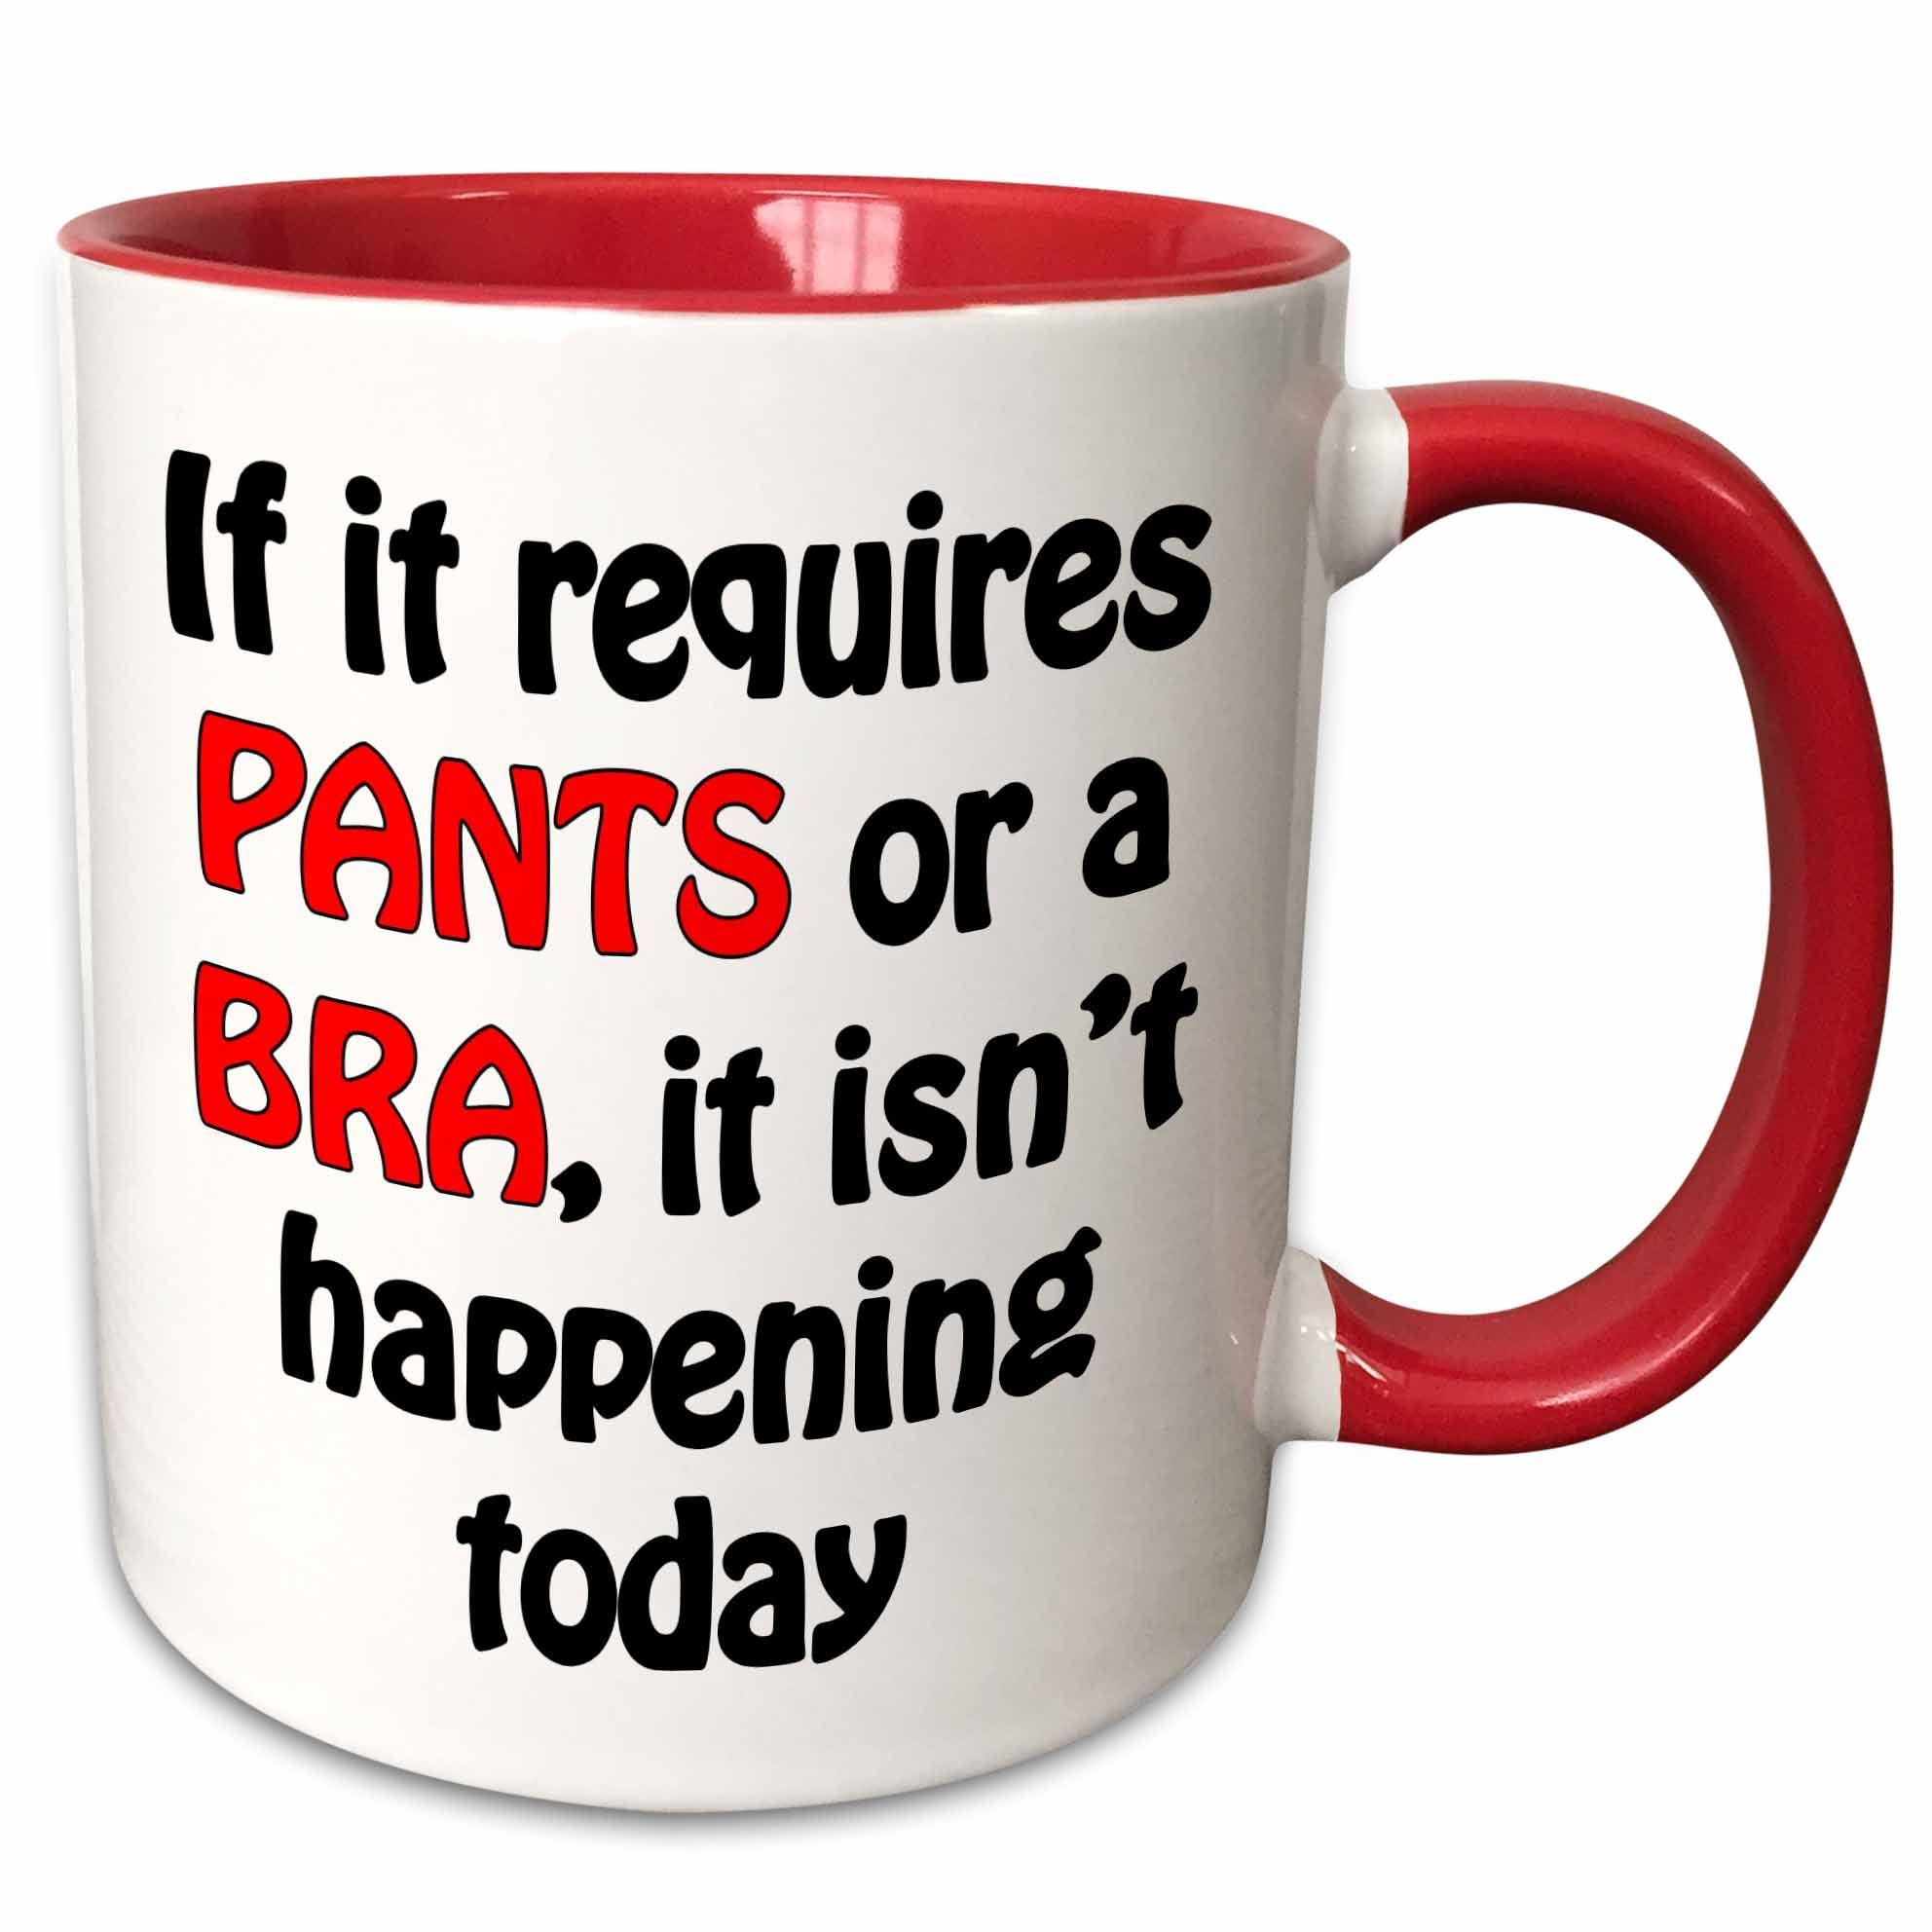 "3dRose 212368_5""If It Requires Pants Or A Bra, Black Ceramic Mug, 11 oz, Red/White"